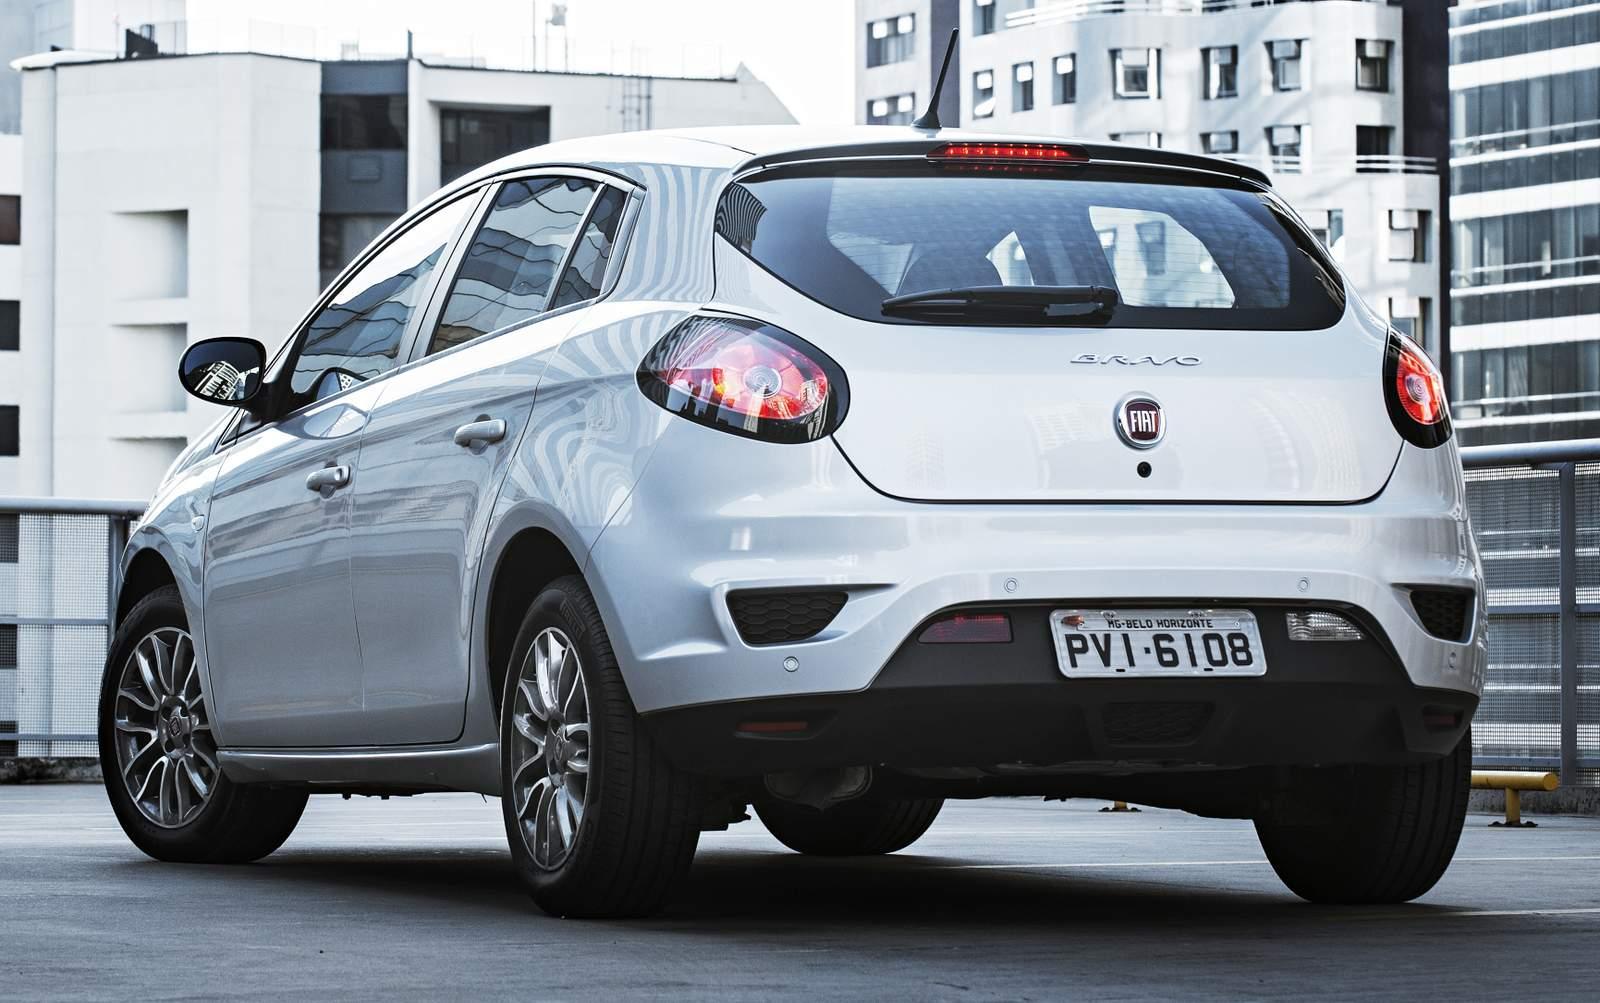 Fiat Bravo - Hatch médio menos vendido de 2016